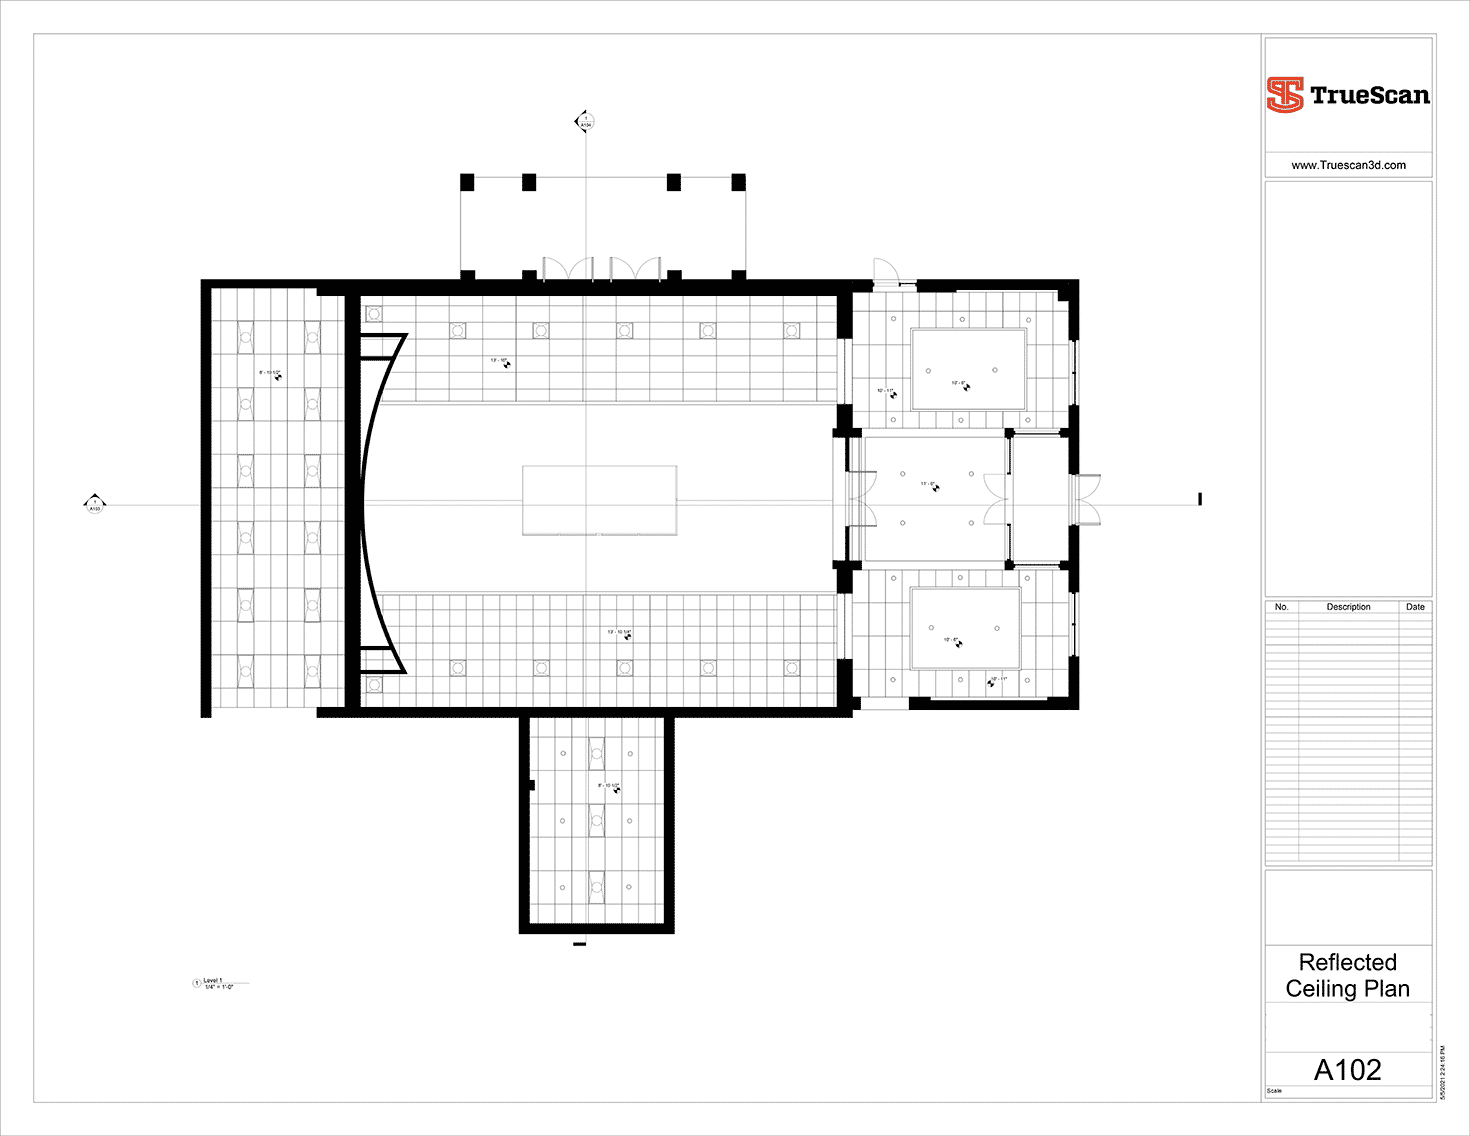 as-built plan